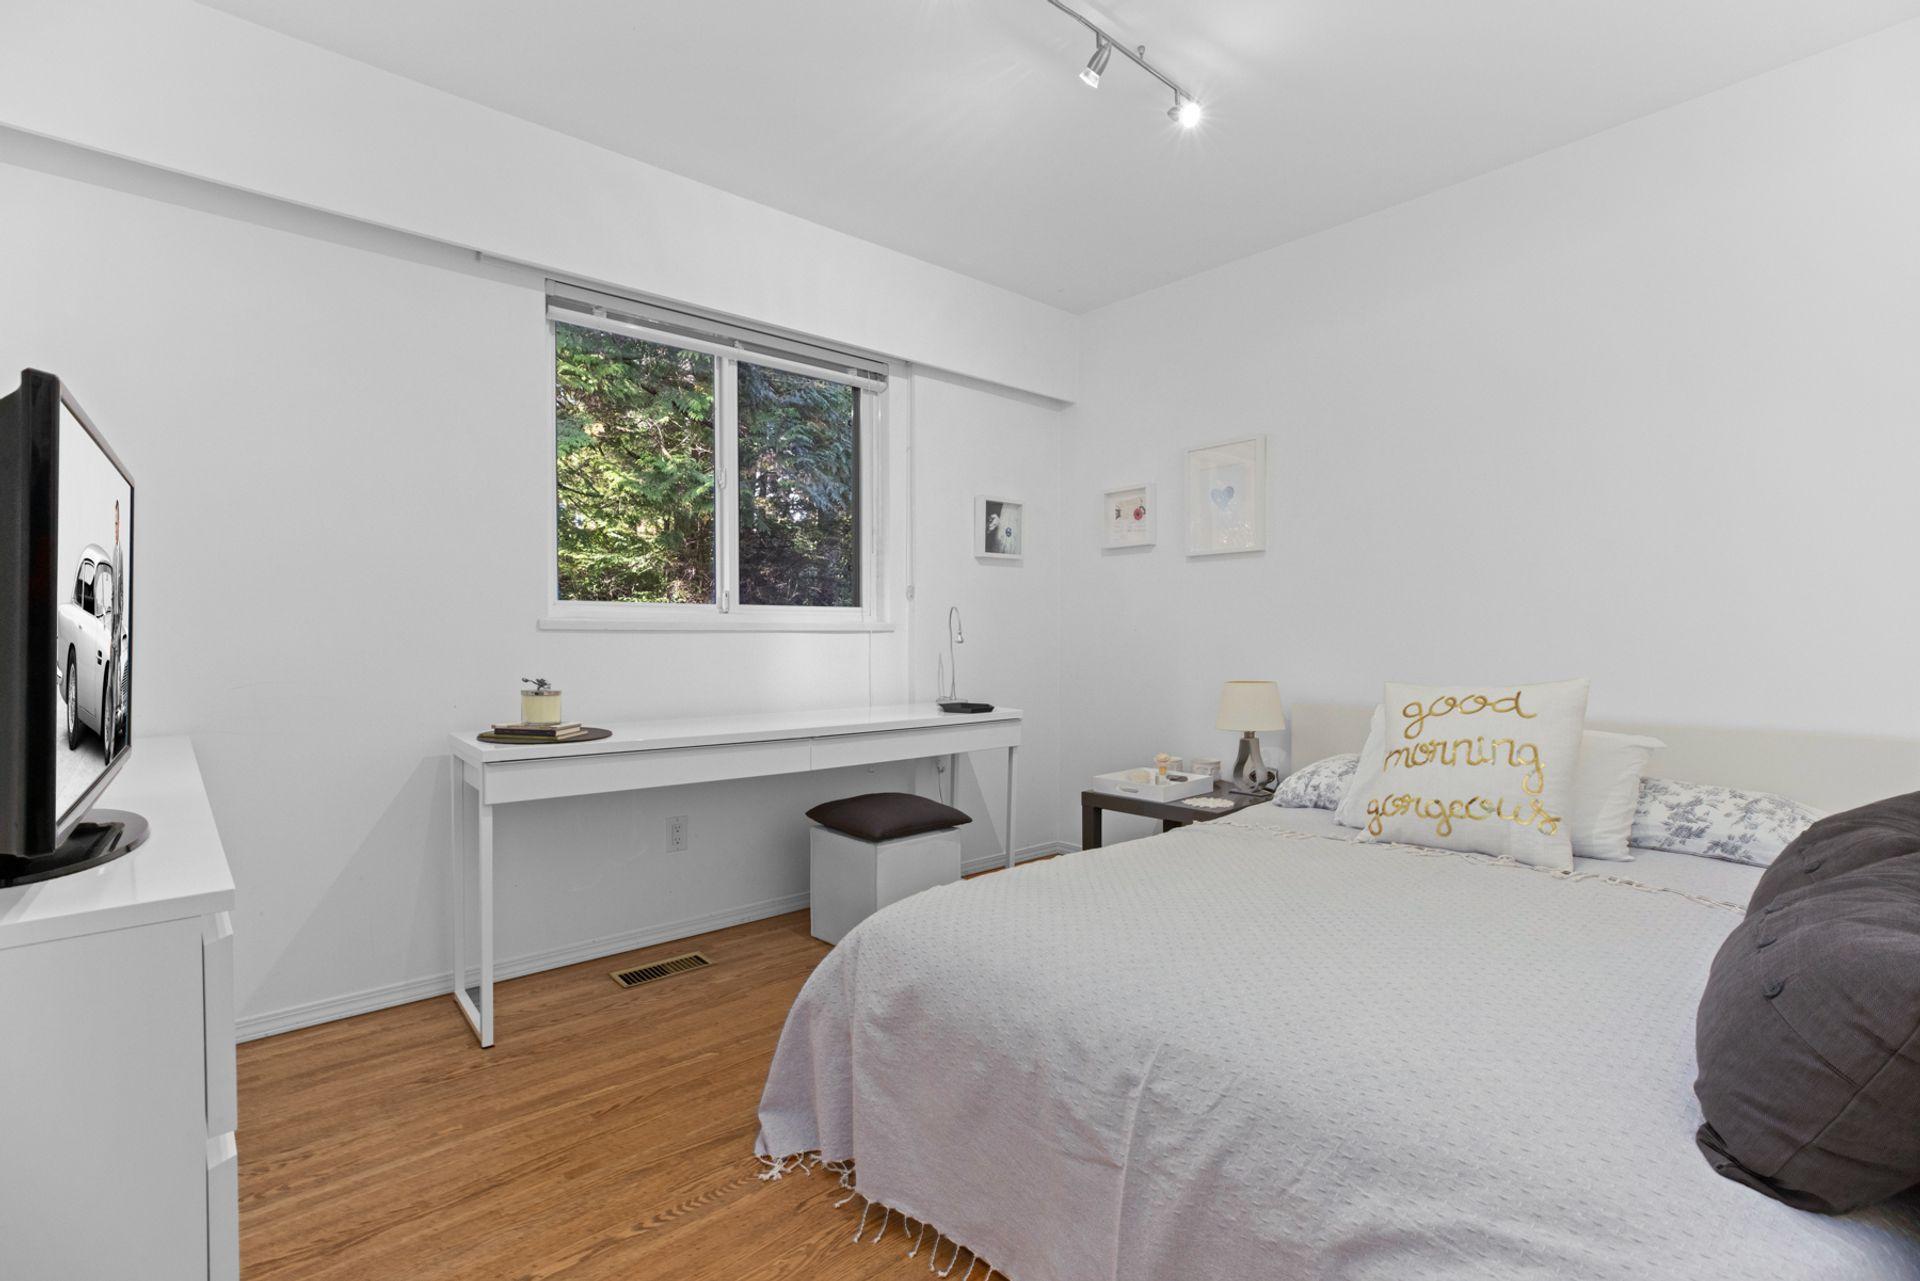 86 Stevens Drive, British Properties, West Vancouver - web-15